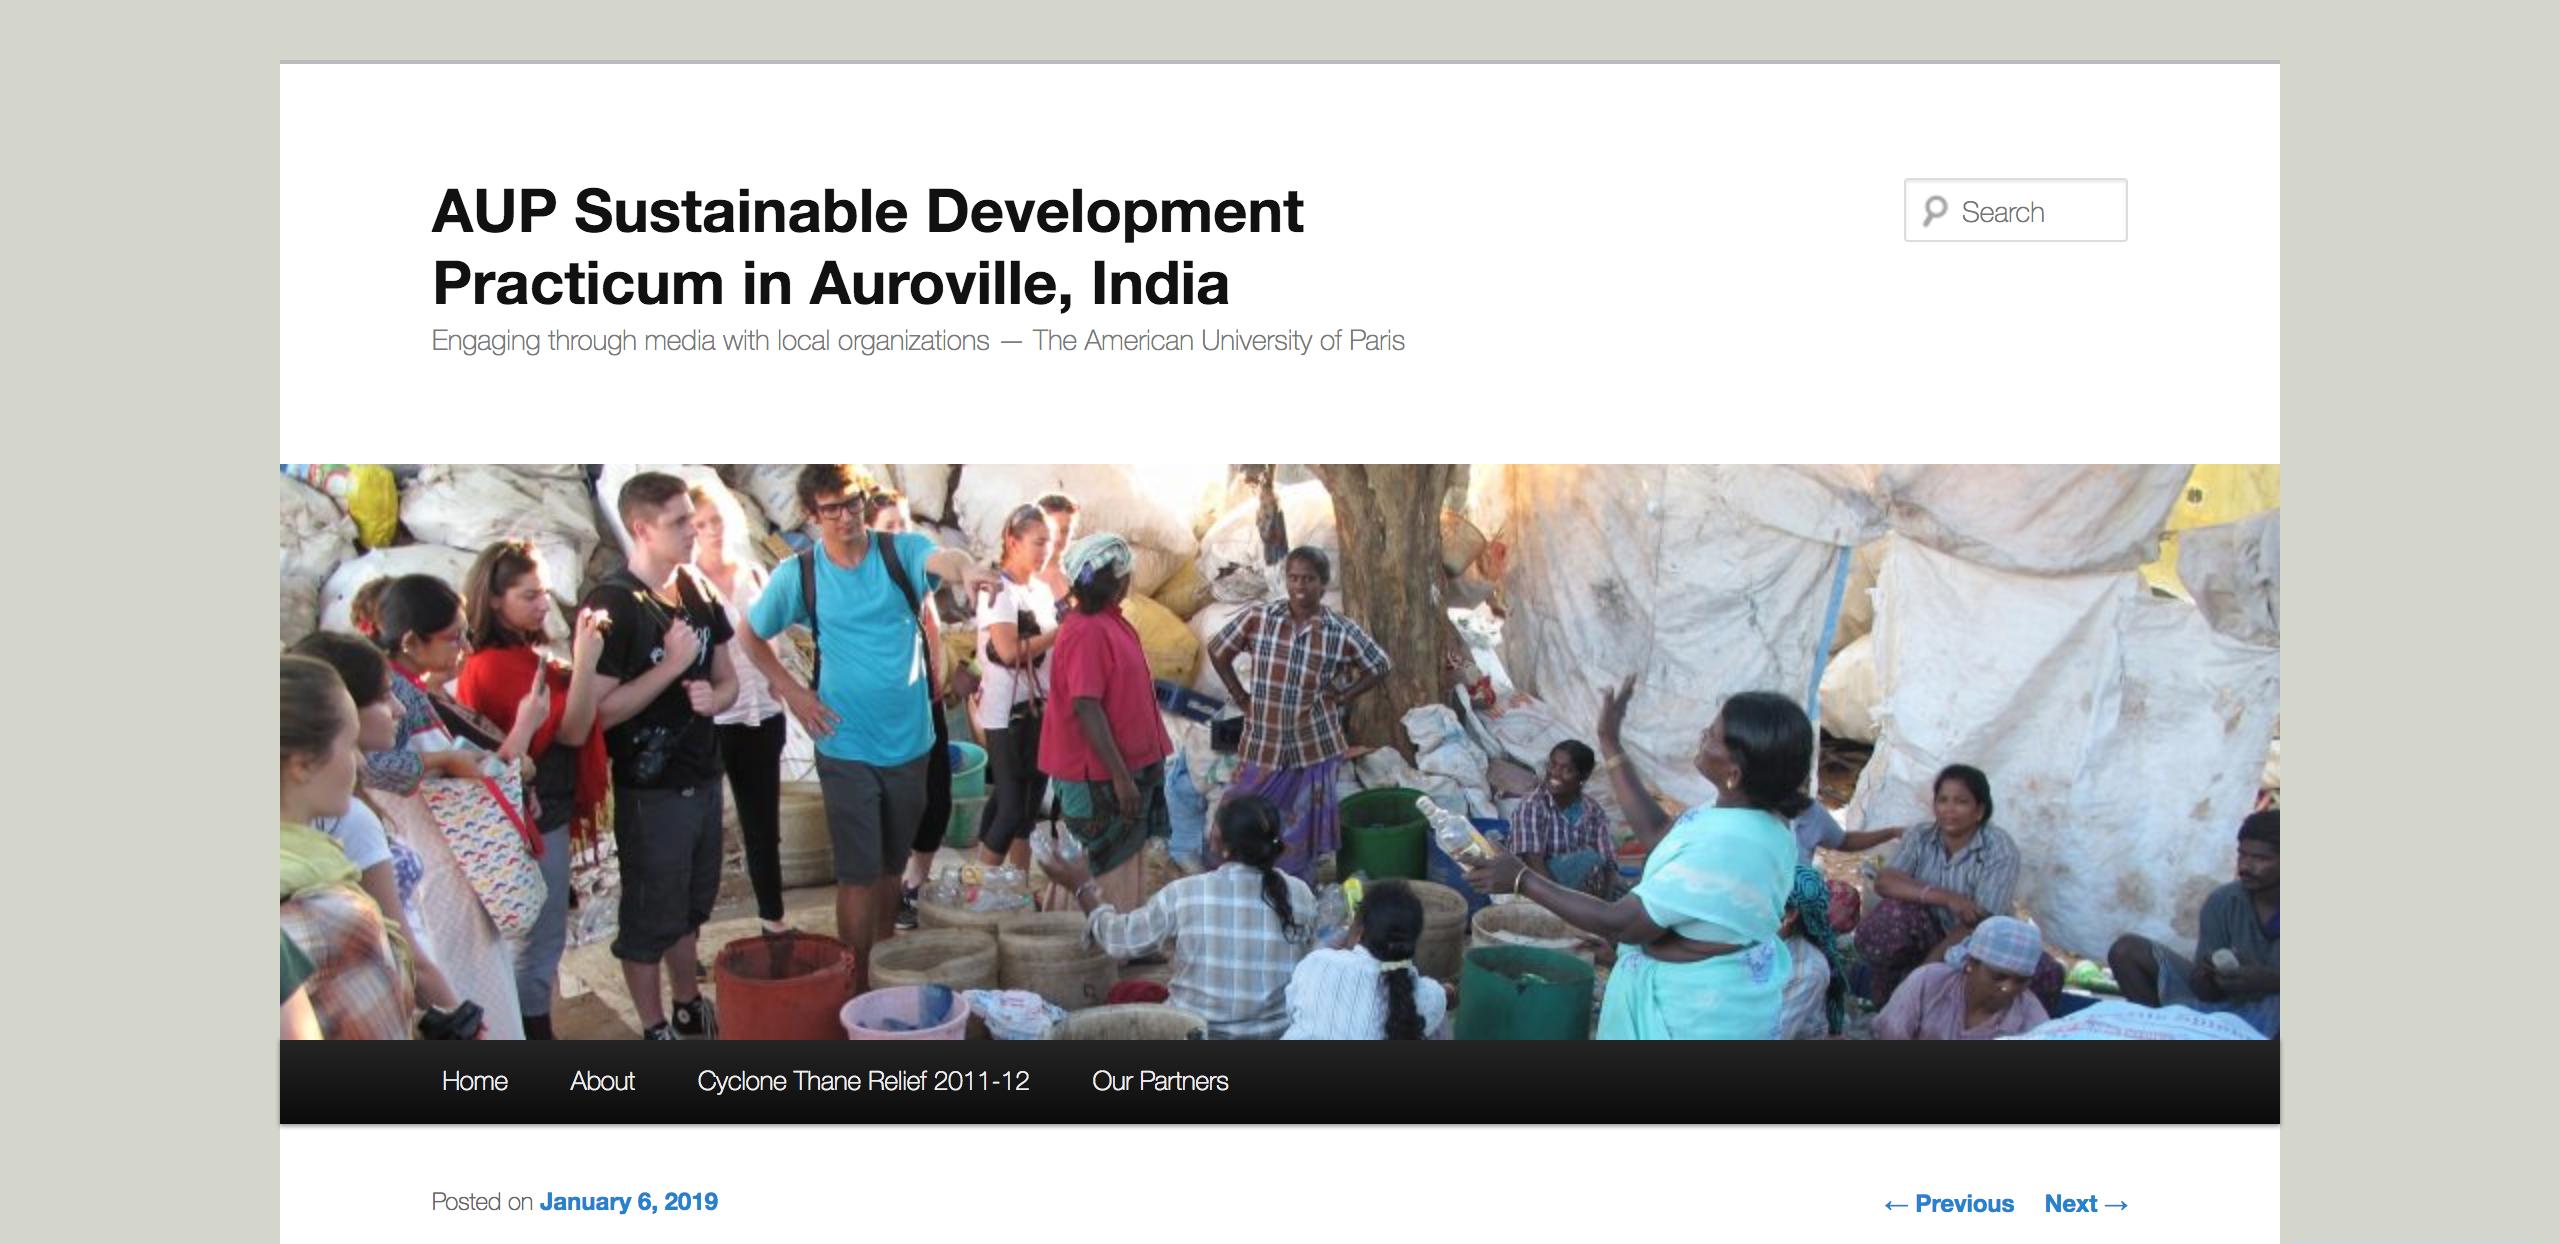 AUP Sustainable Development Practicum in Auroville, India